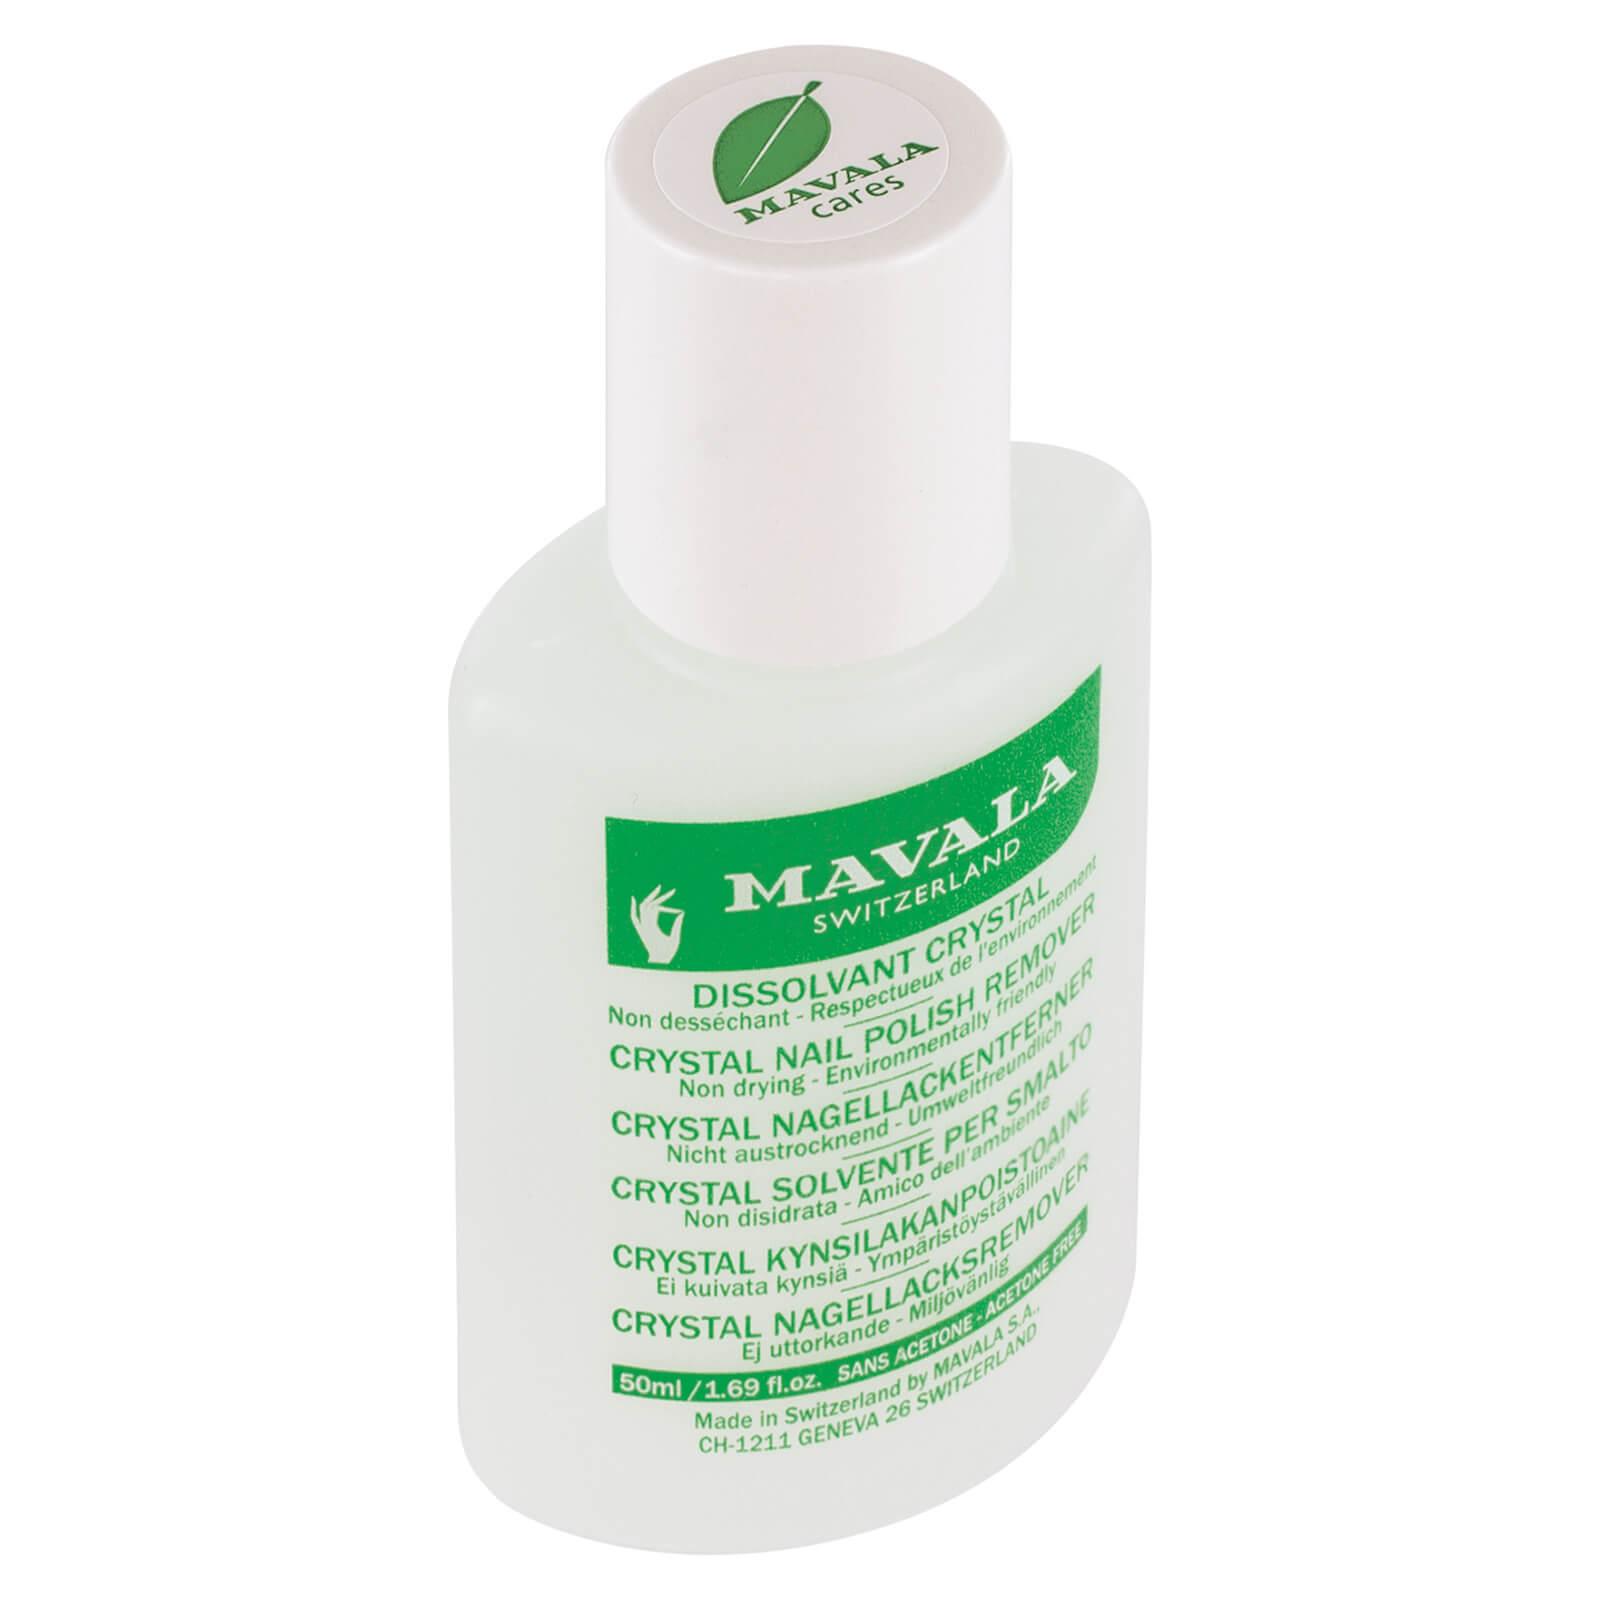 Mavala Crystal Nail Varnish Remover 50ml